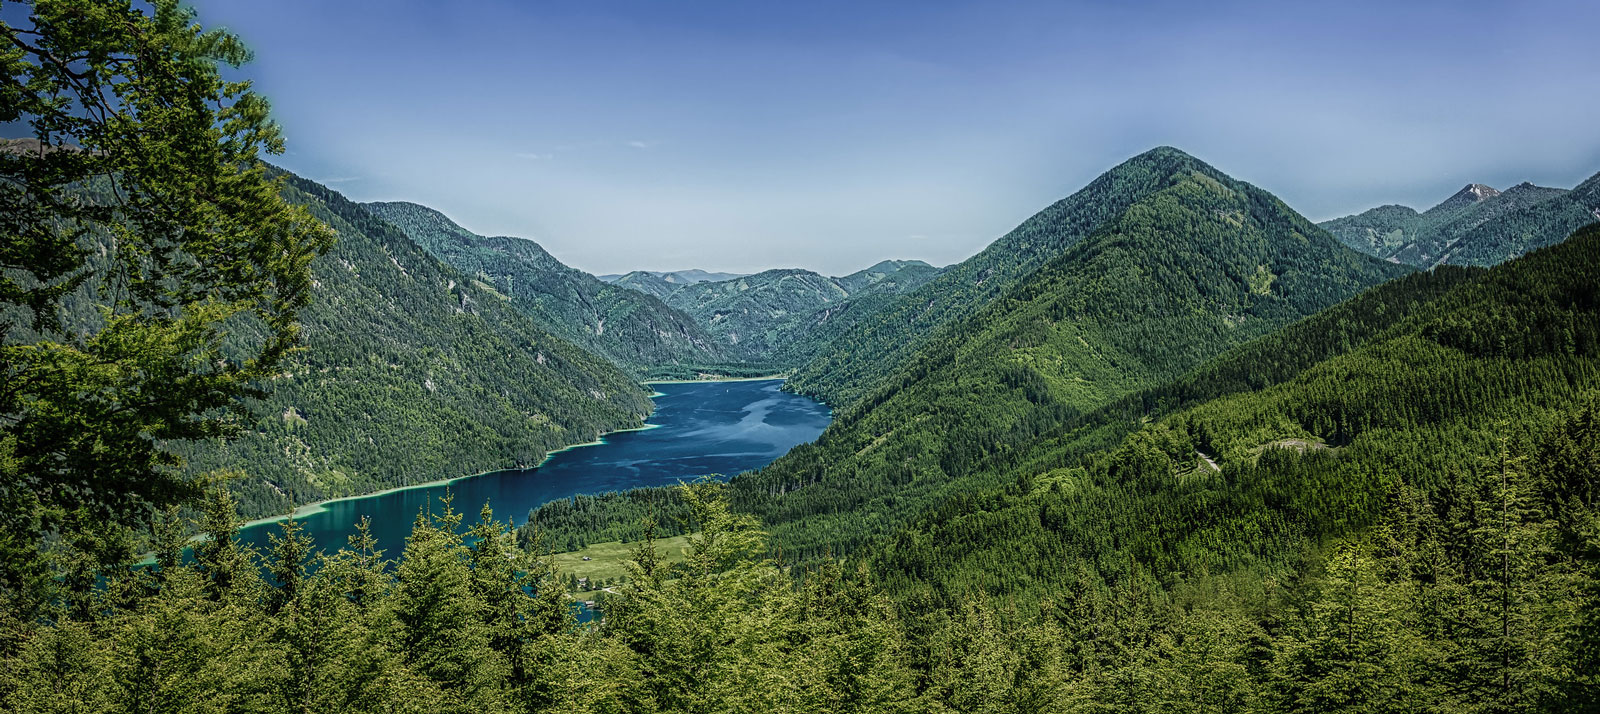 Der sauberste See Kärntens: Weißensee